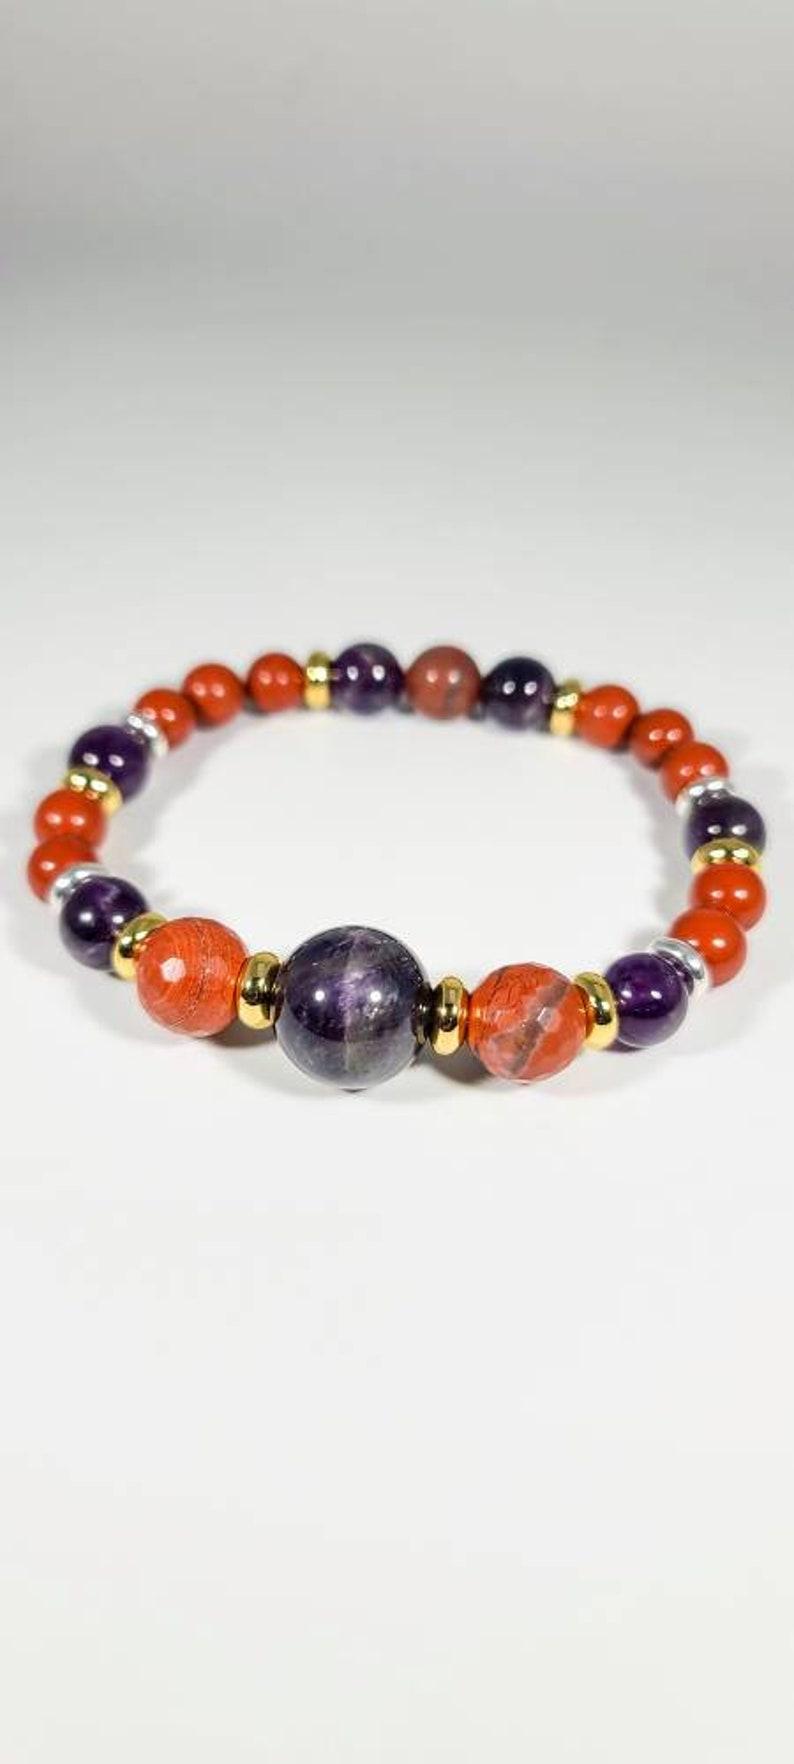 PARMADI Red Jasper Amethyst /& Bloodstone Bracelet